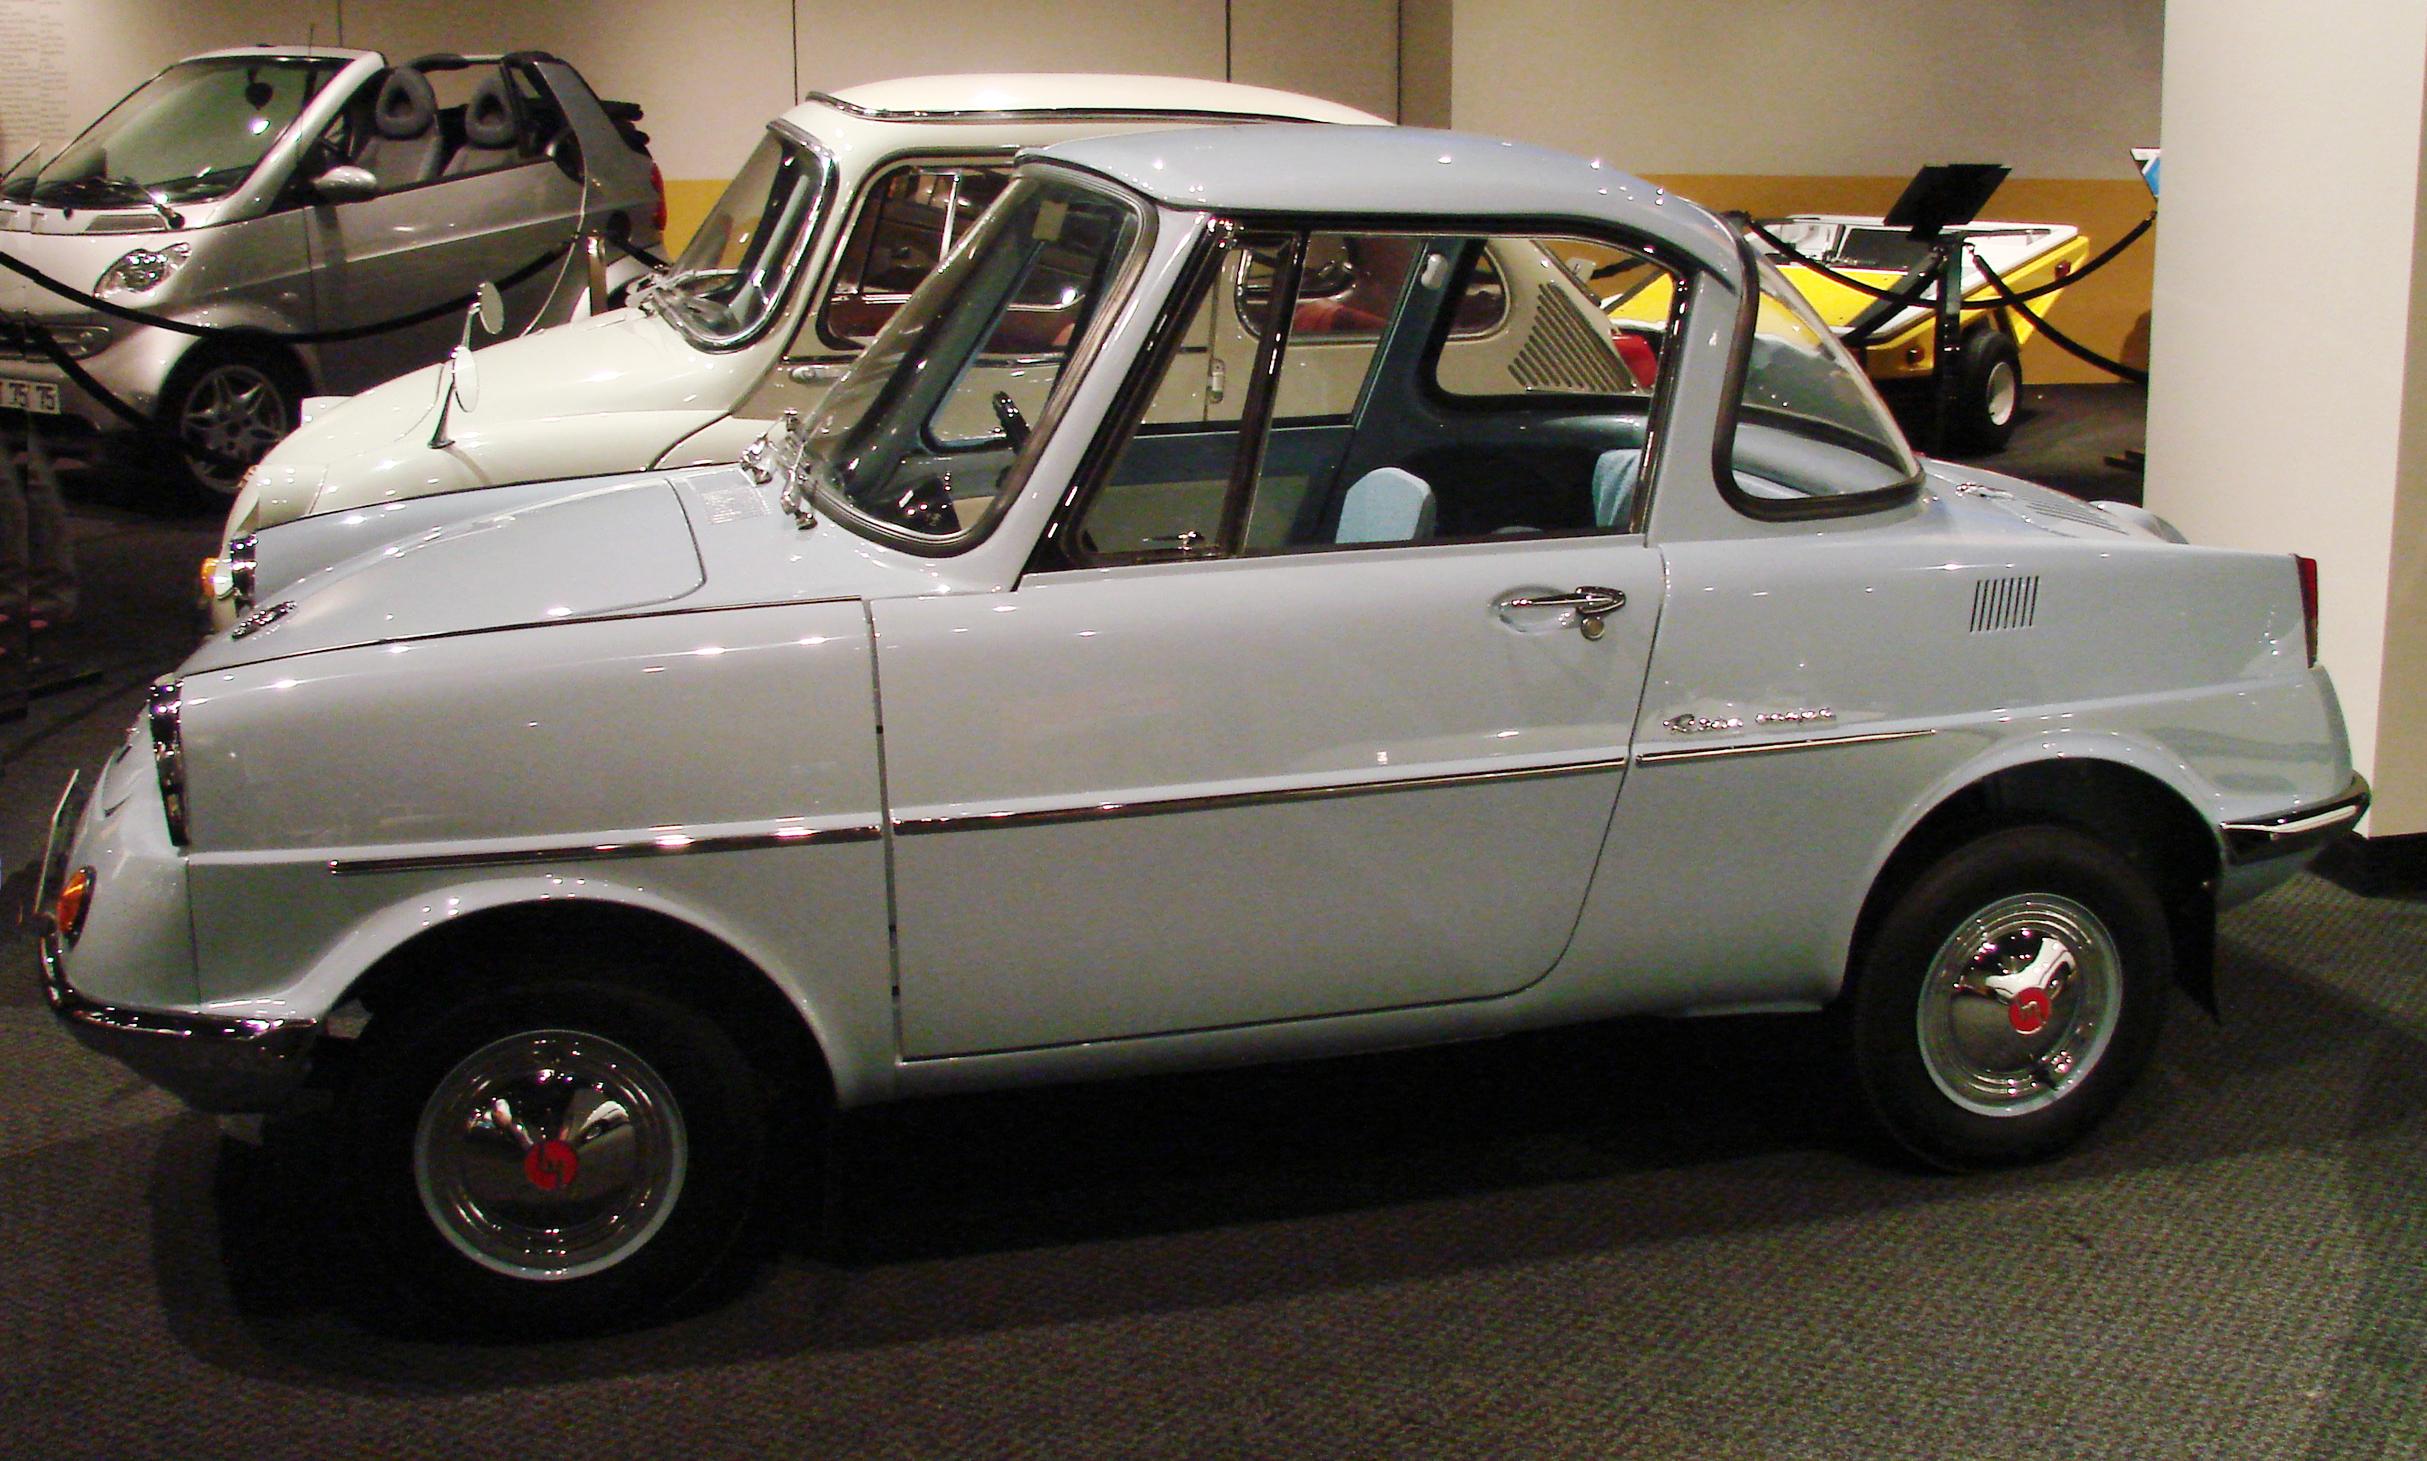 File:Mazda R360 Coupé.jpg - Wikimedia Commons